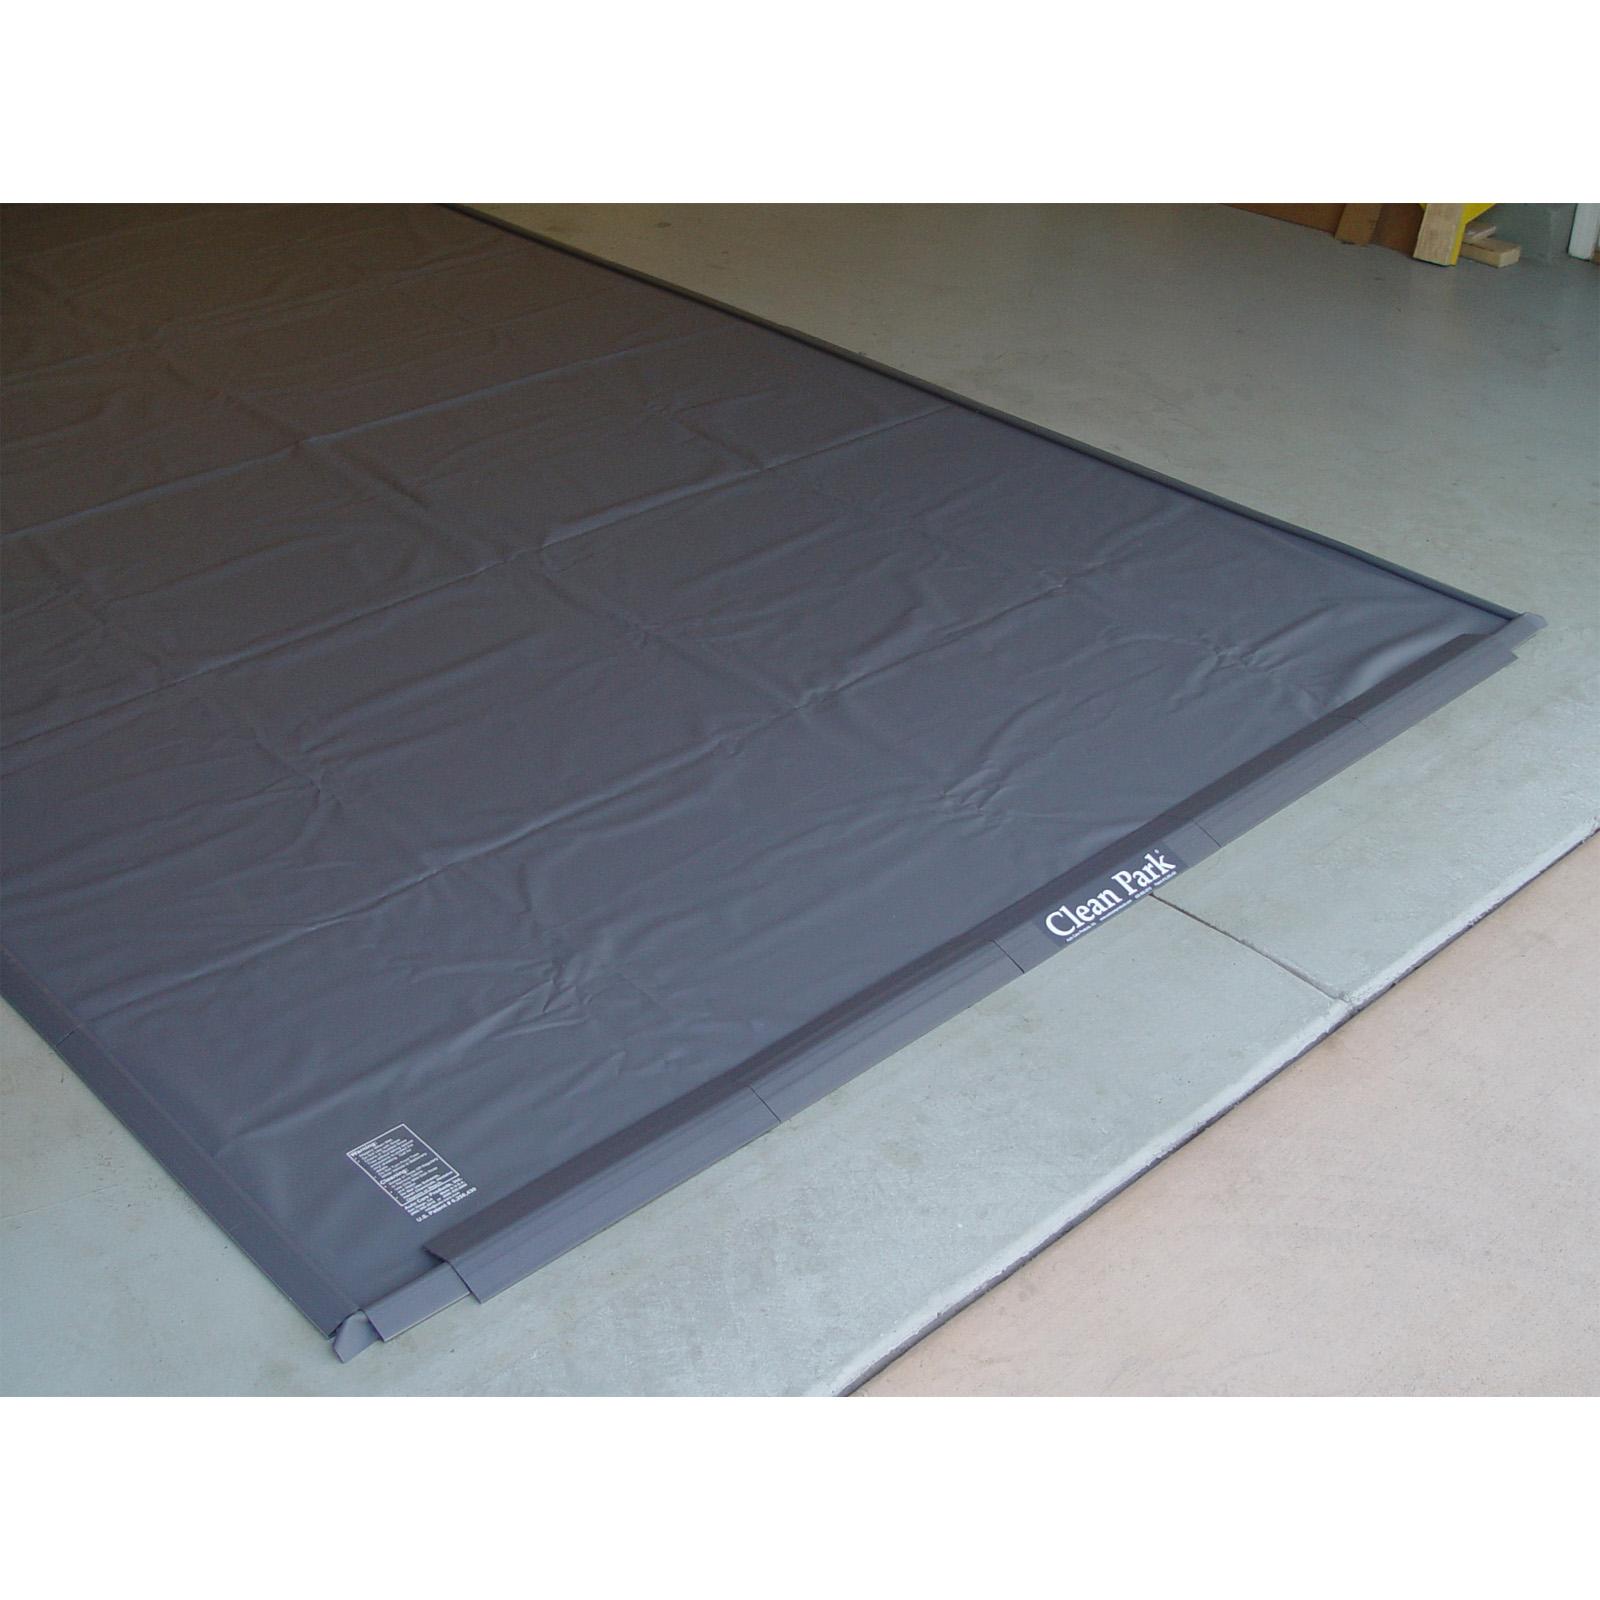 Image of Clean Park 7.5' x 18' Garage Mat